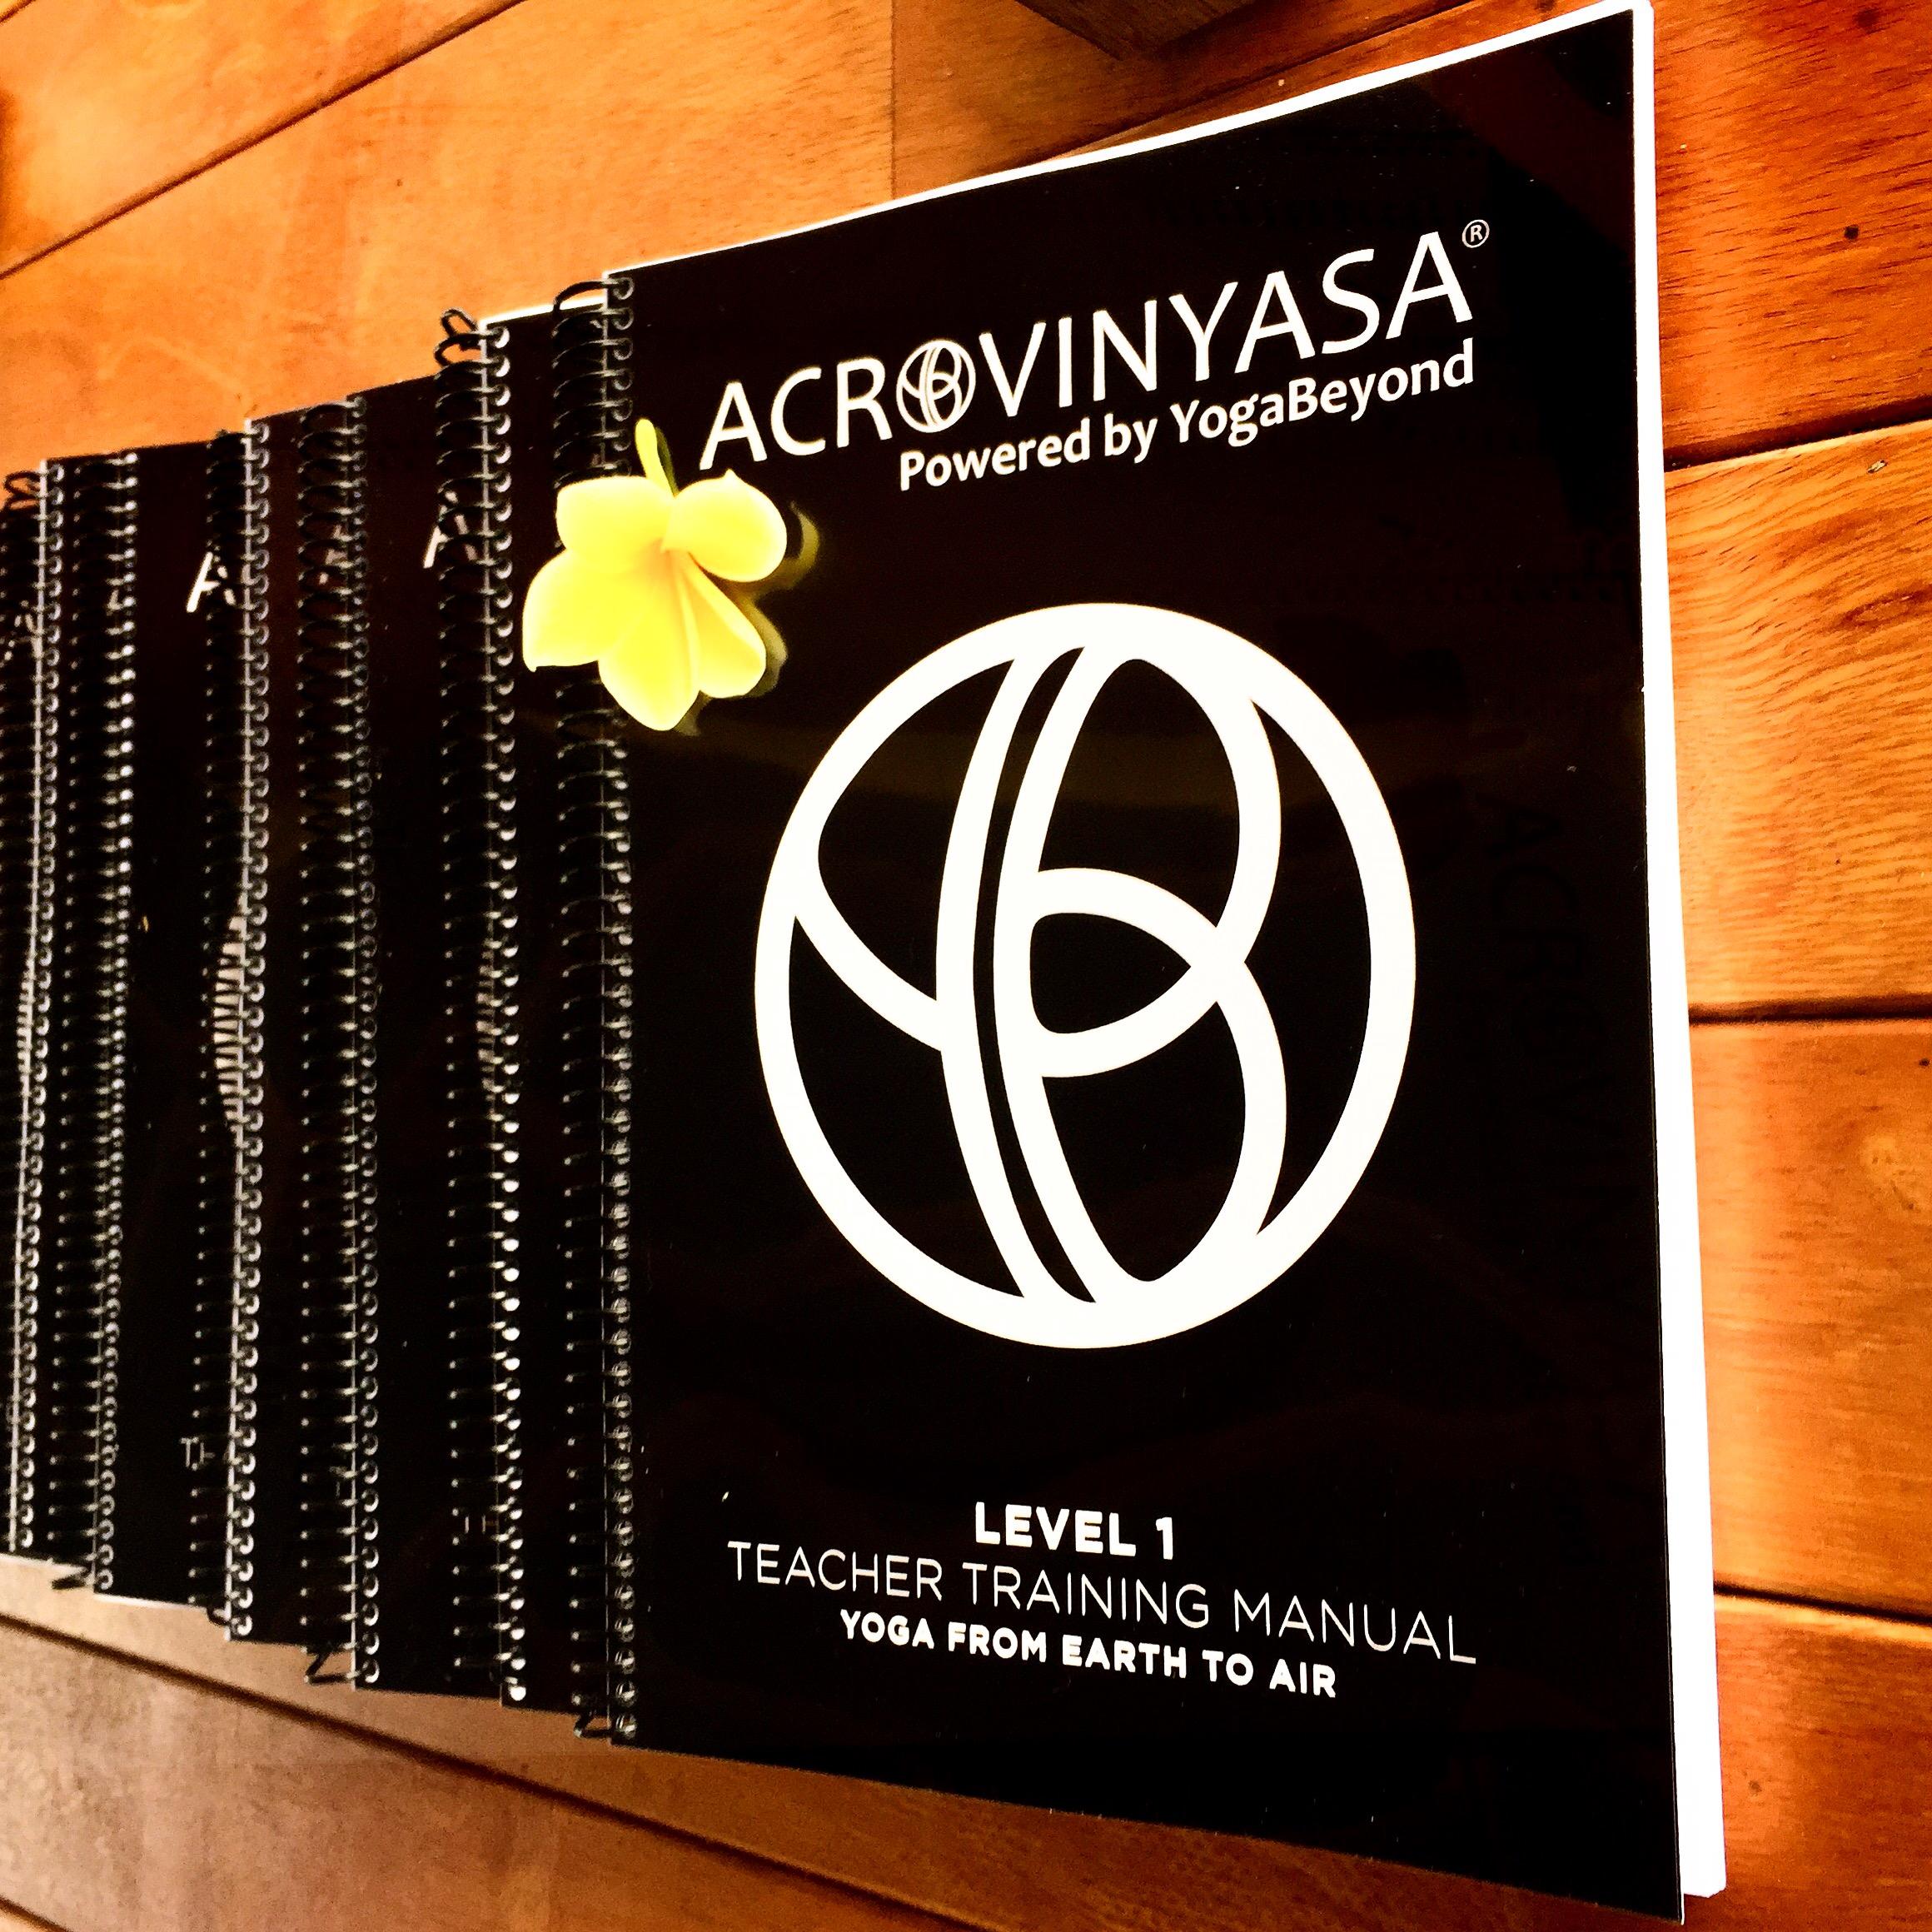 ACROVINYASA7.JPG